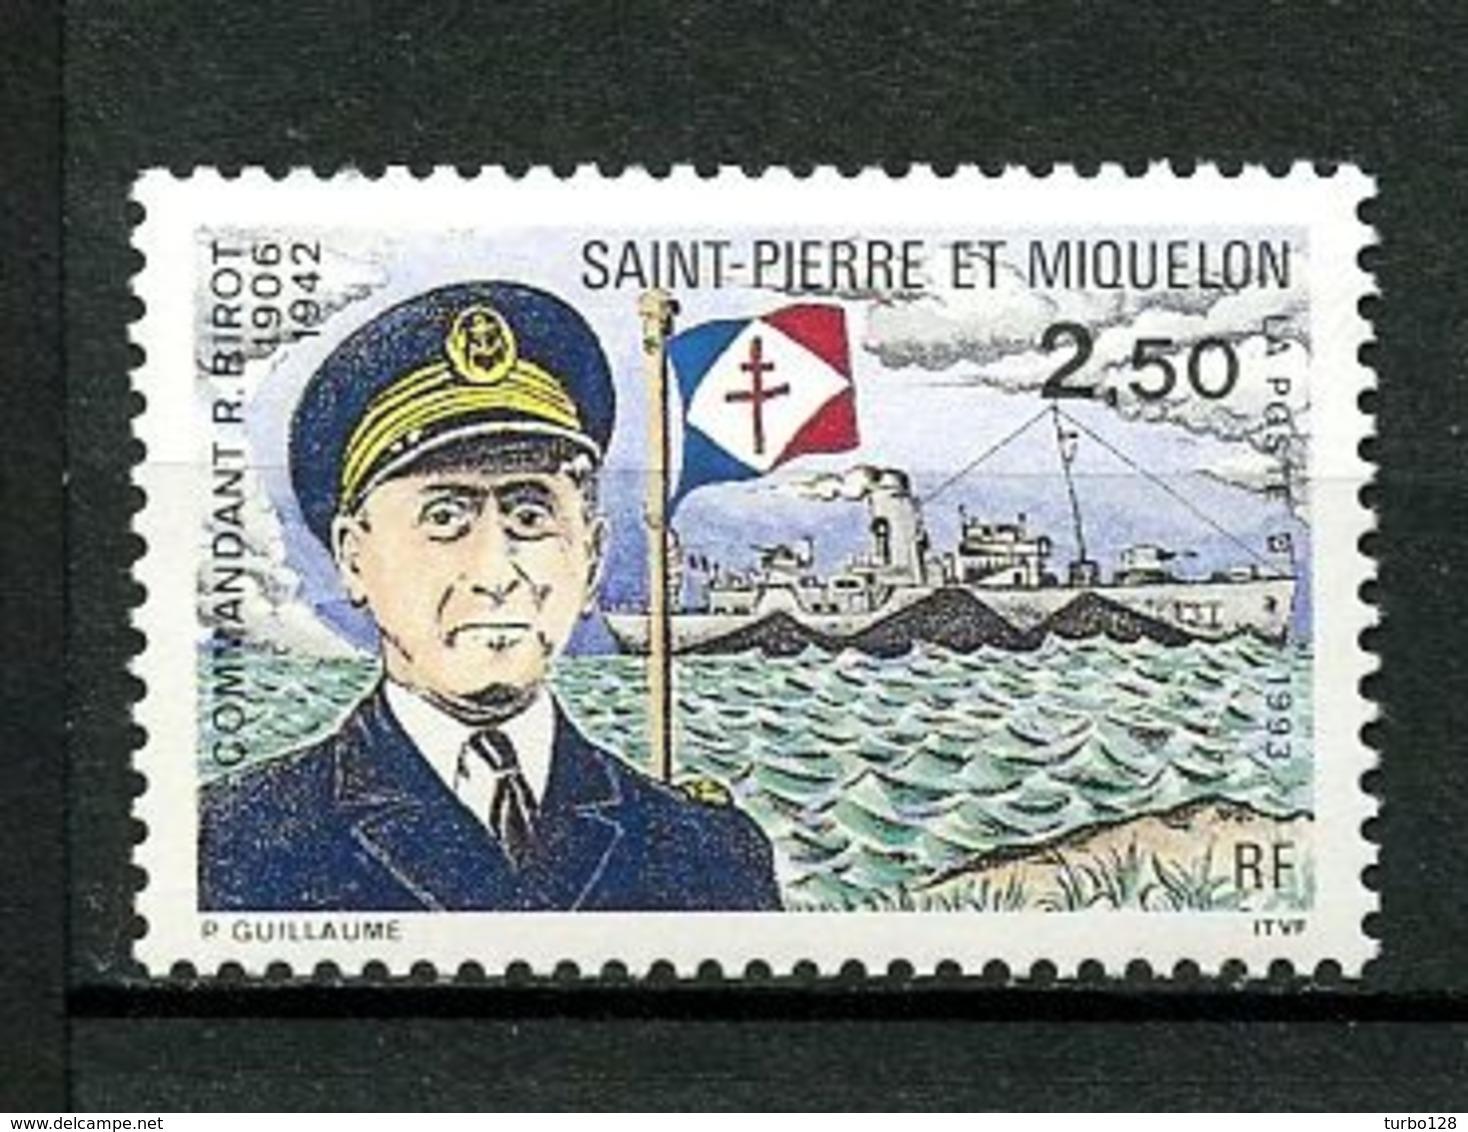 SPM MIQUELON 1993  N° 573 ** Neuf  MNH Superbe C 1.65 €  Bateaux Boats Ships Commandant BIROT - Neufs